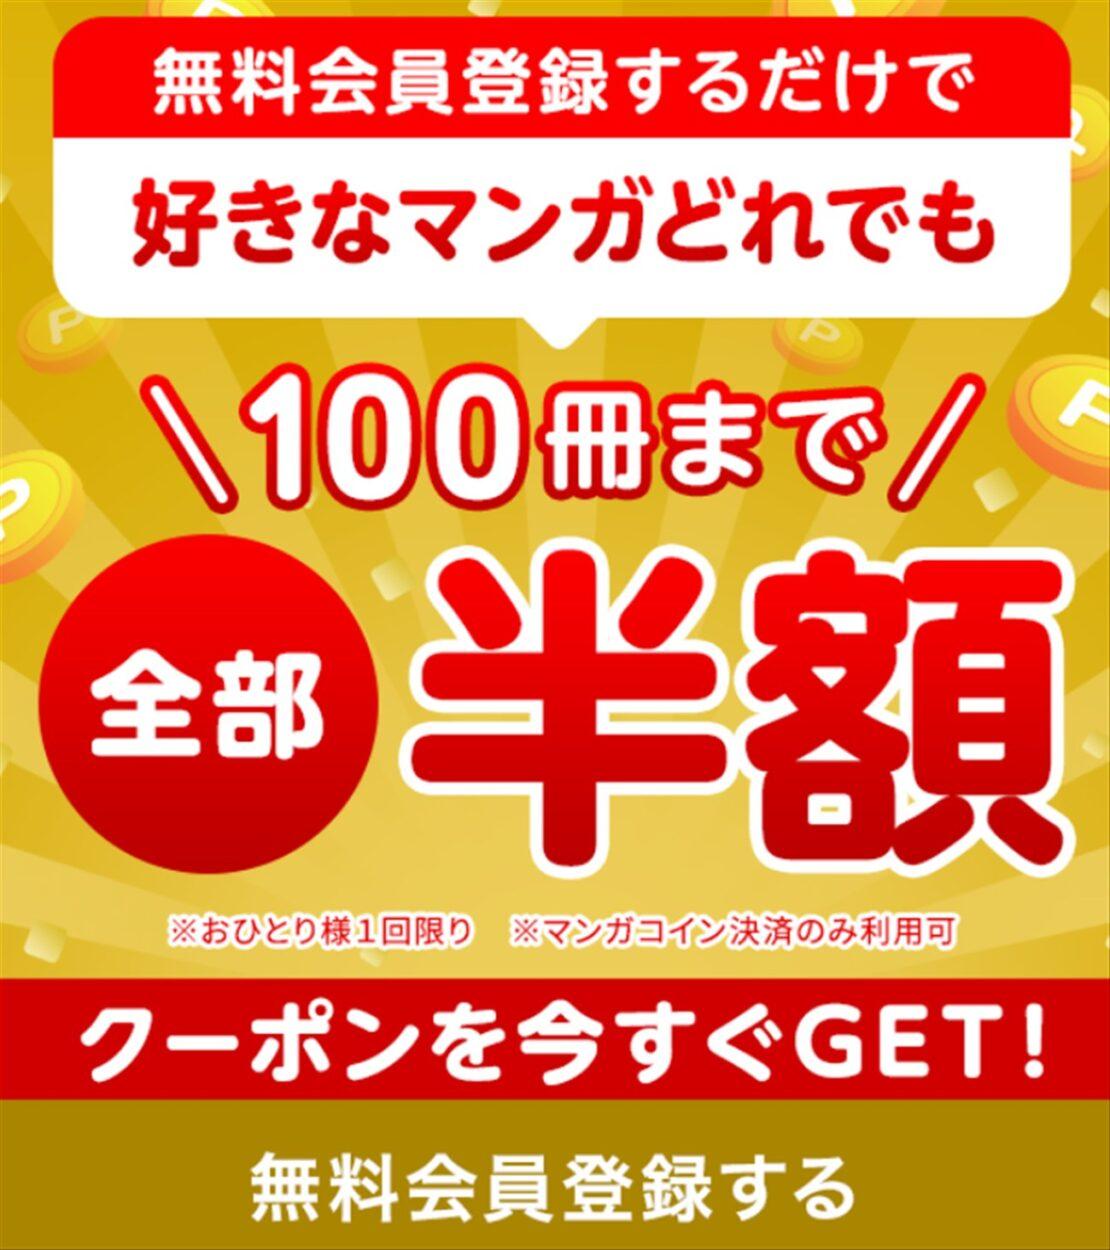 amebaマンガの100冊半額クーポン